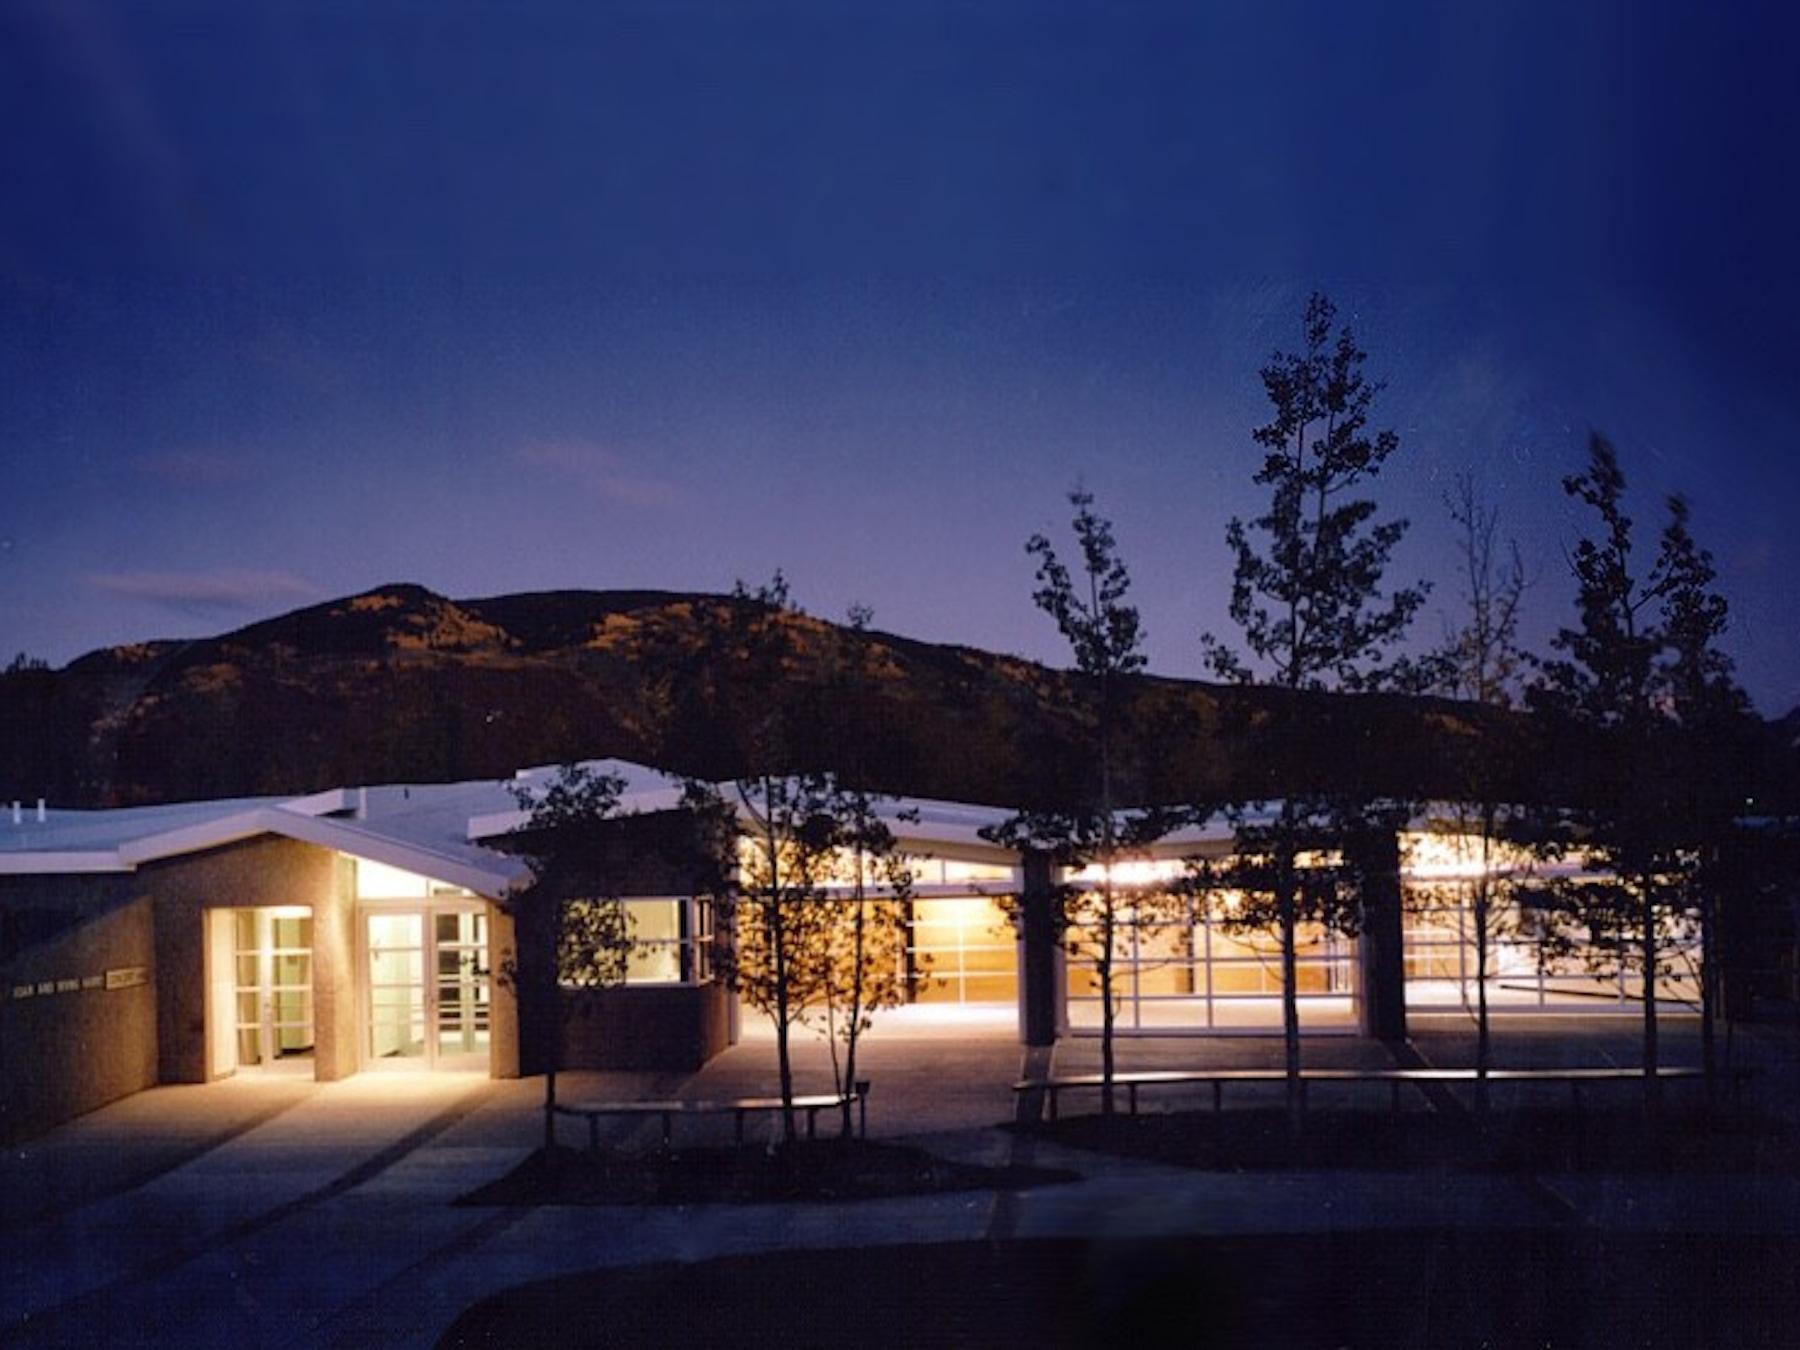 Night Harris Hall